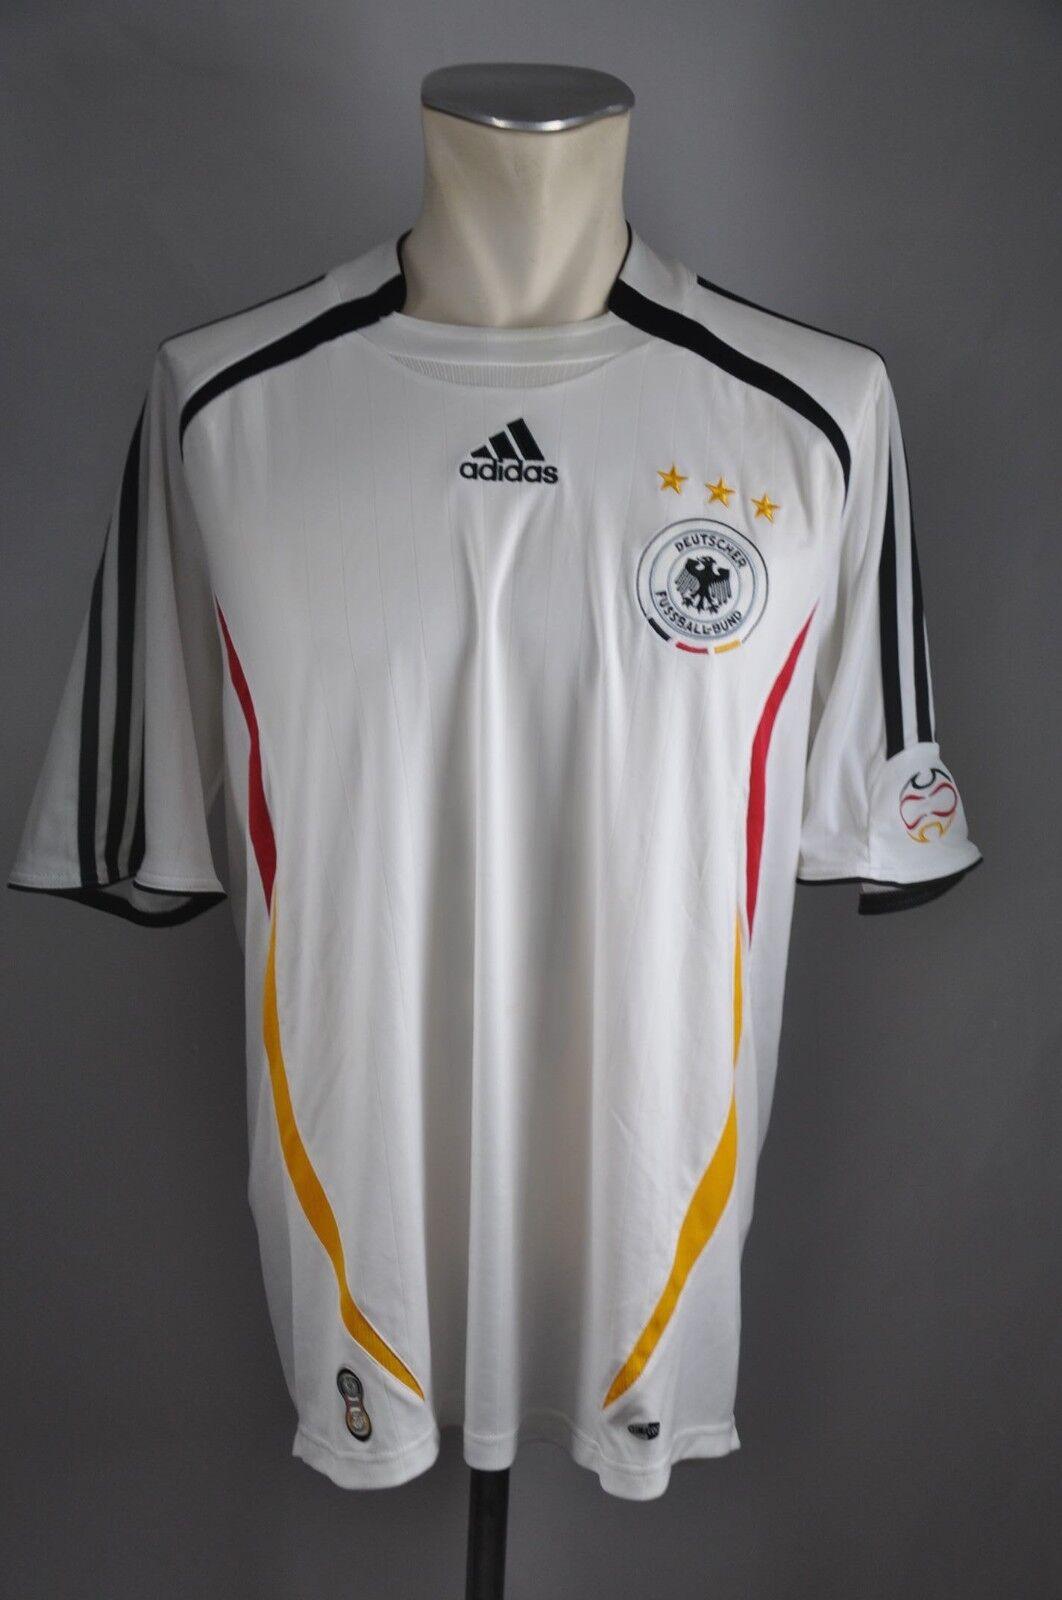 Deutschland Trikot 2006 Gr. L DFB Adidas white WM Jersey Home EM Germany